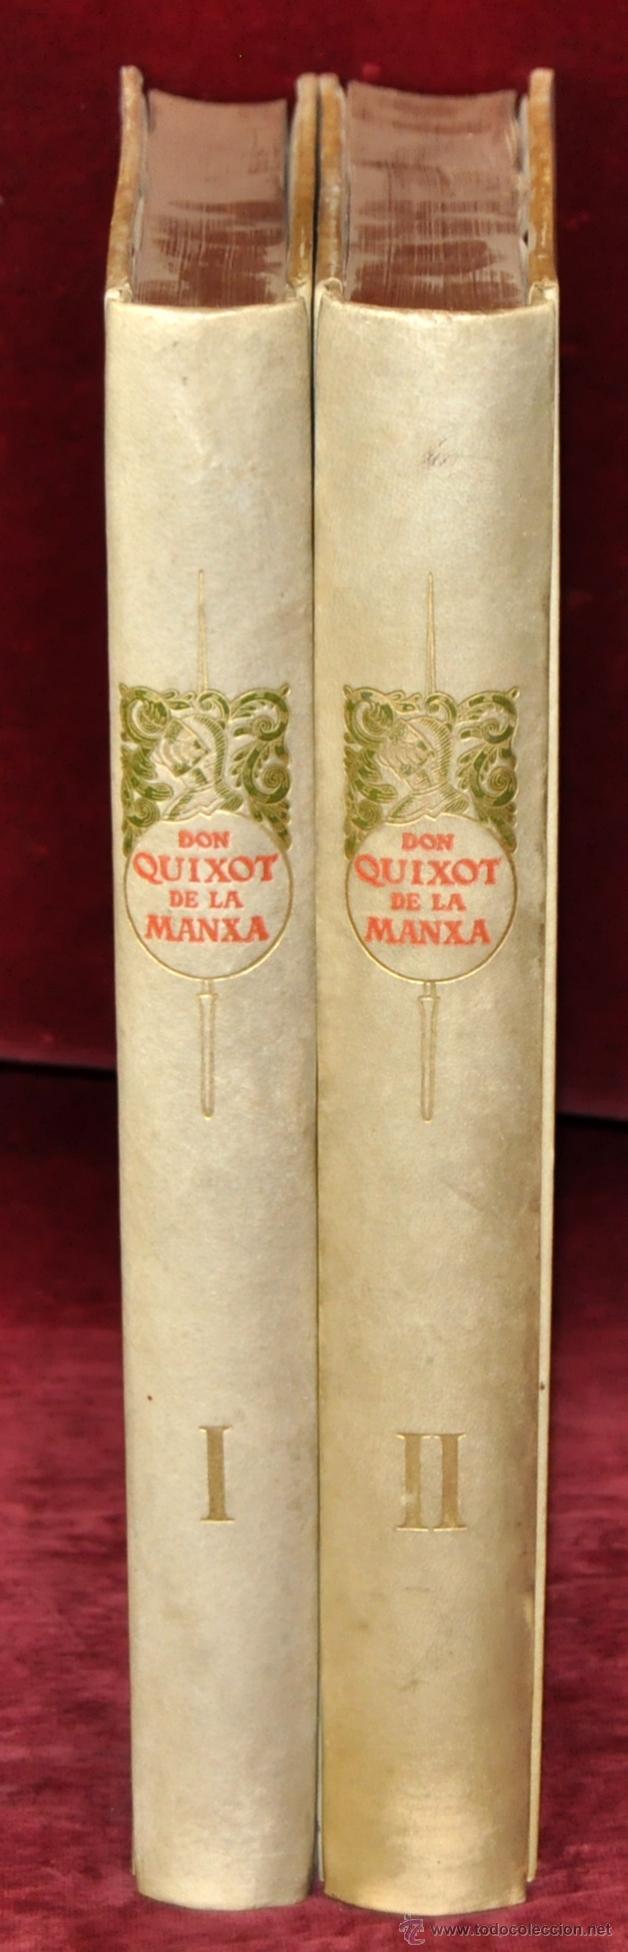 Libros de segunda mano: LENGINYOS CAVALLER DON QUIXOT DE LA MANXA. CERVANTES. EDIT. OCTAVI VIADER. 2 TOMOS. QUIJOTE MANCHA - Foto 3 - 54123283